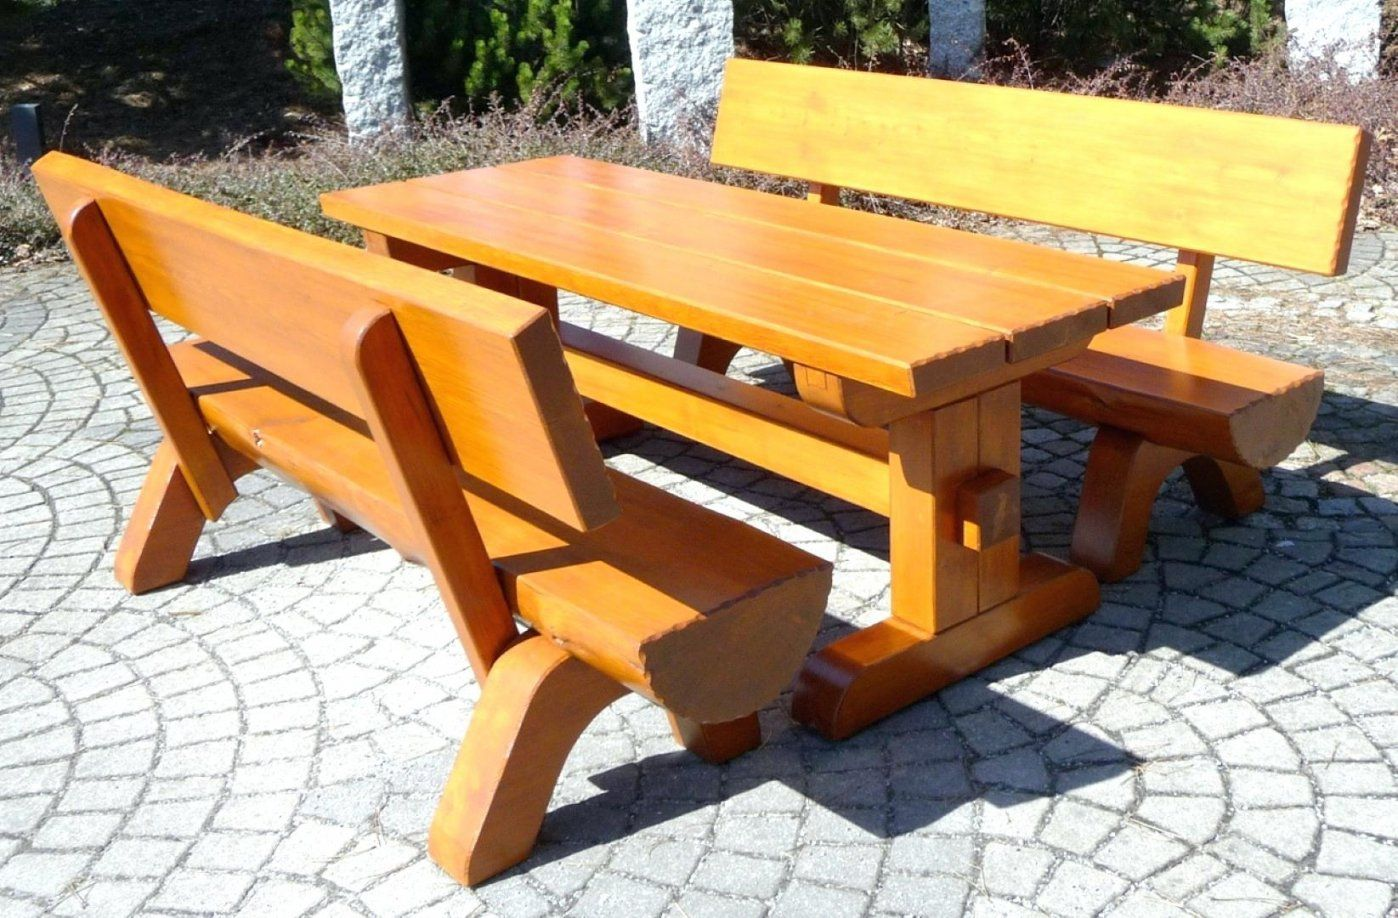 Sitzbank Tisch Kombination Holzbank Selber Bauen Galerien Sitzbank